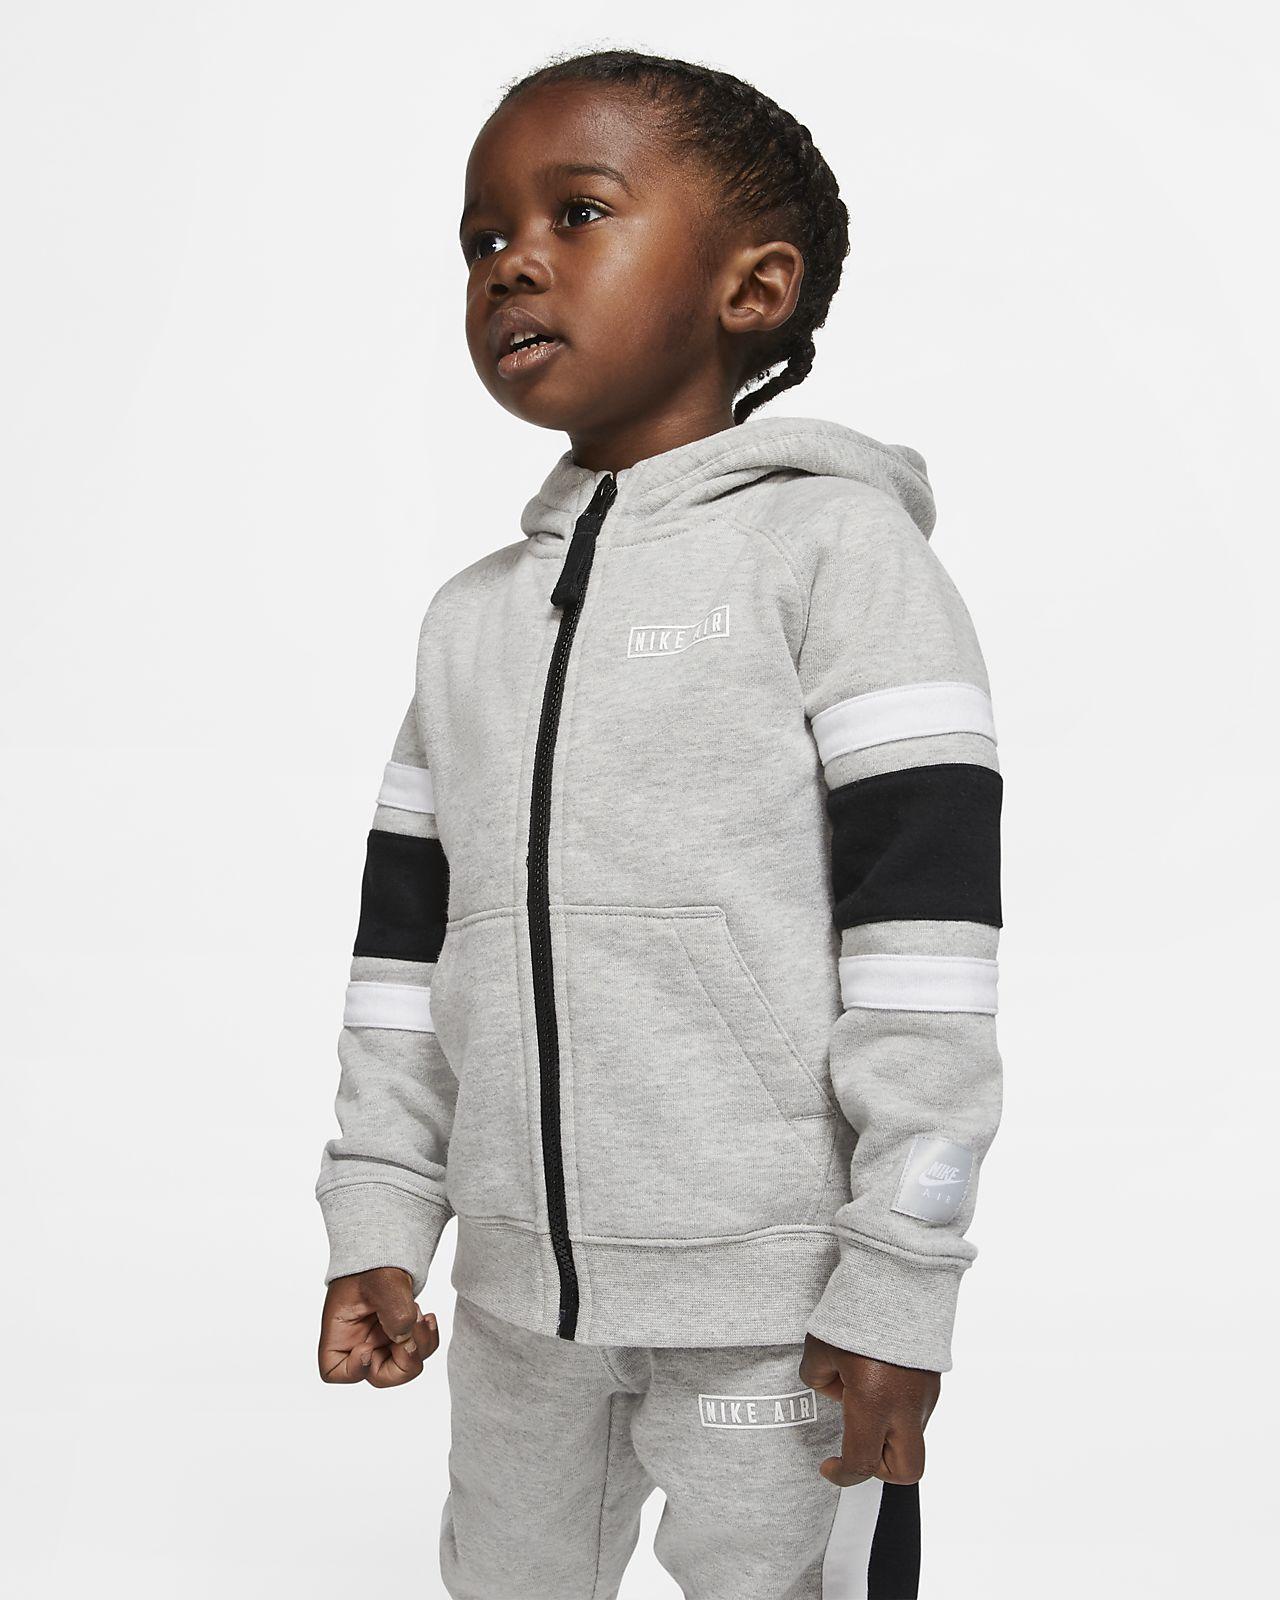 Nike Air hosszú cipzáras, kapucnis polárpulóver babáknak